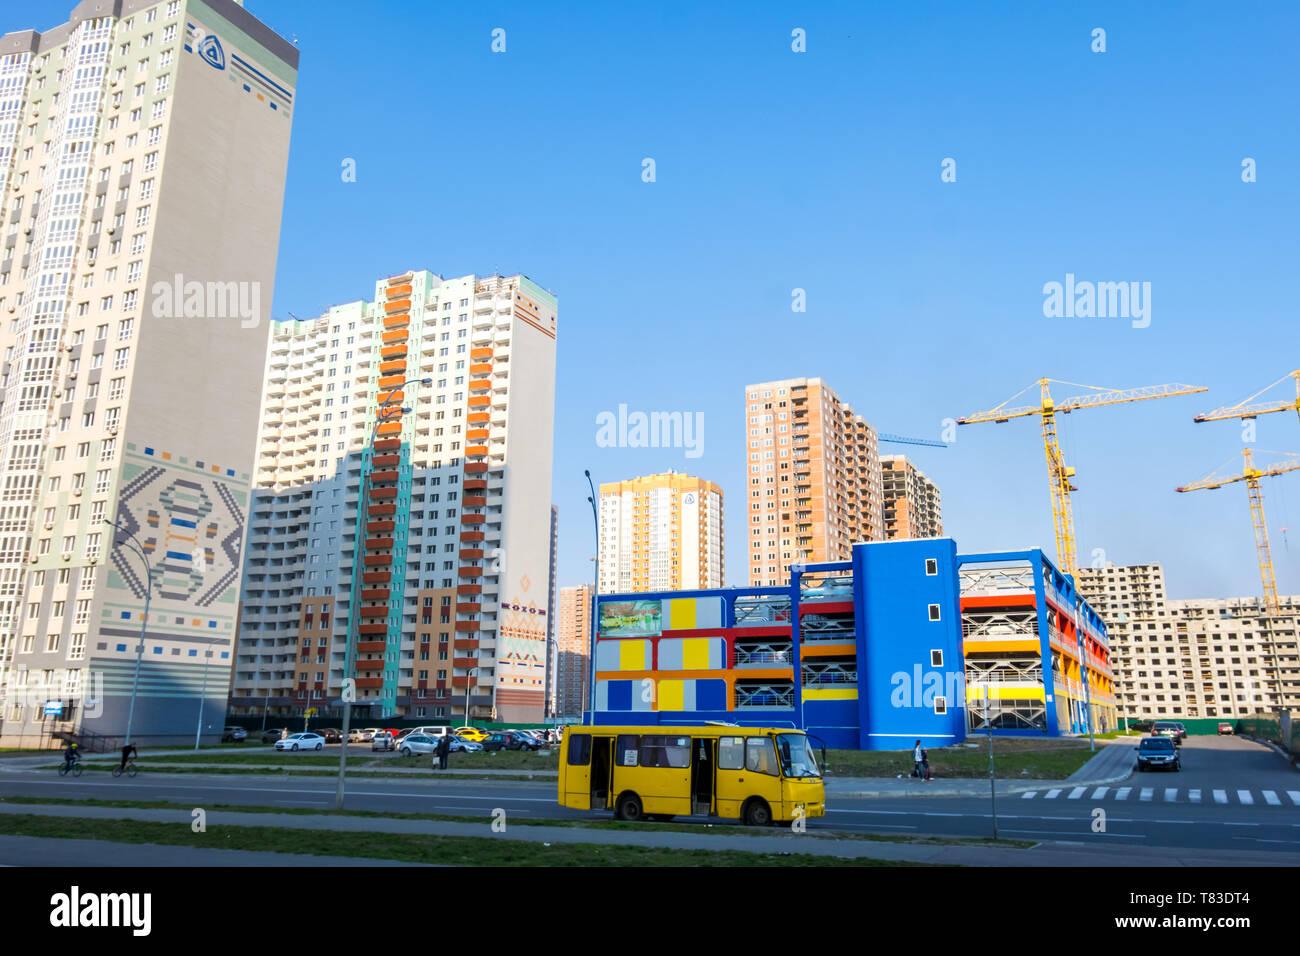 Kyiv, Ukraine - April 06, 2019: New buildings and bright colorful parking on Poznyaki residential area in Darnitskiy district of Kyiv, Ukraine - Stock Image